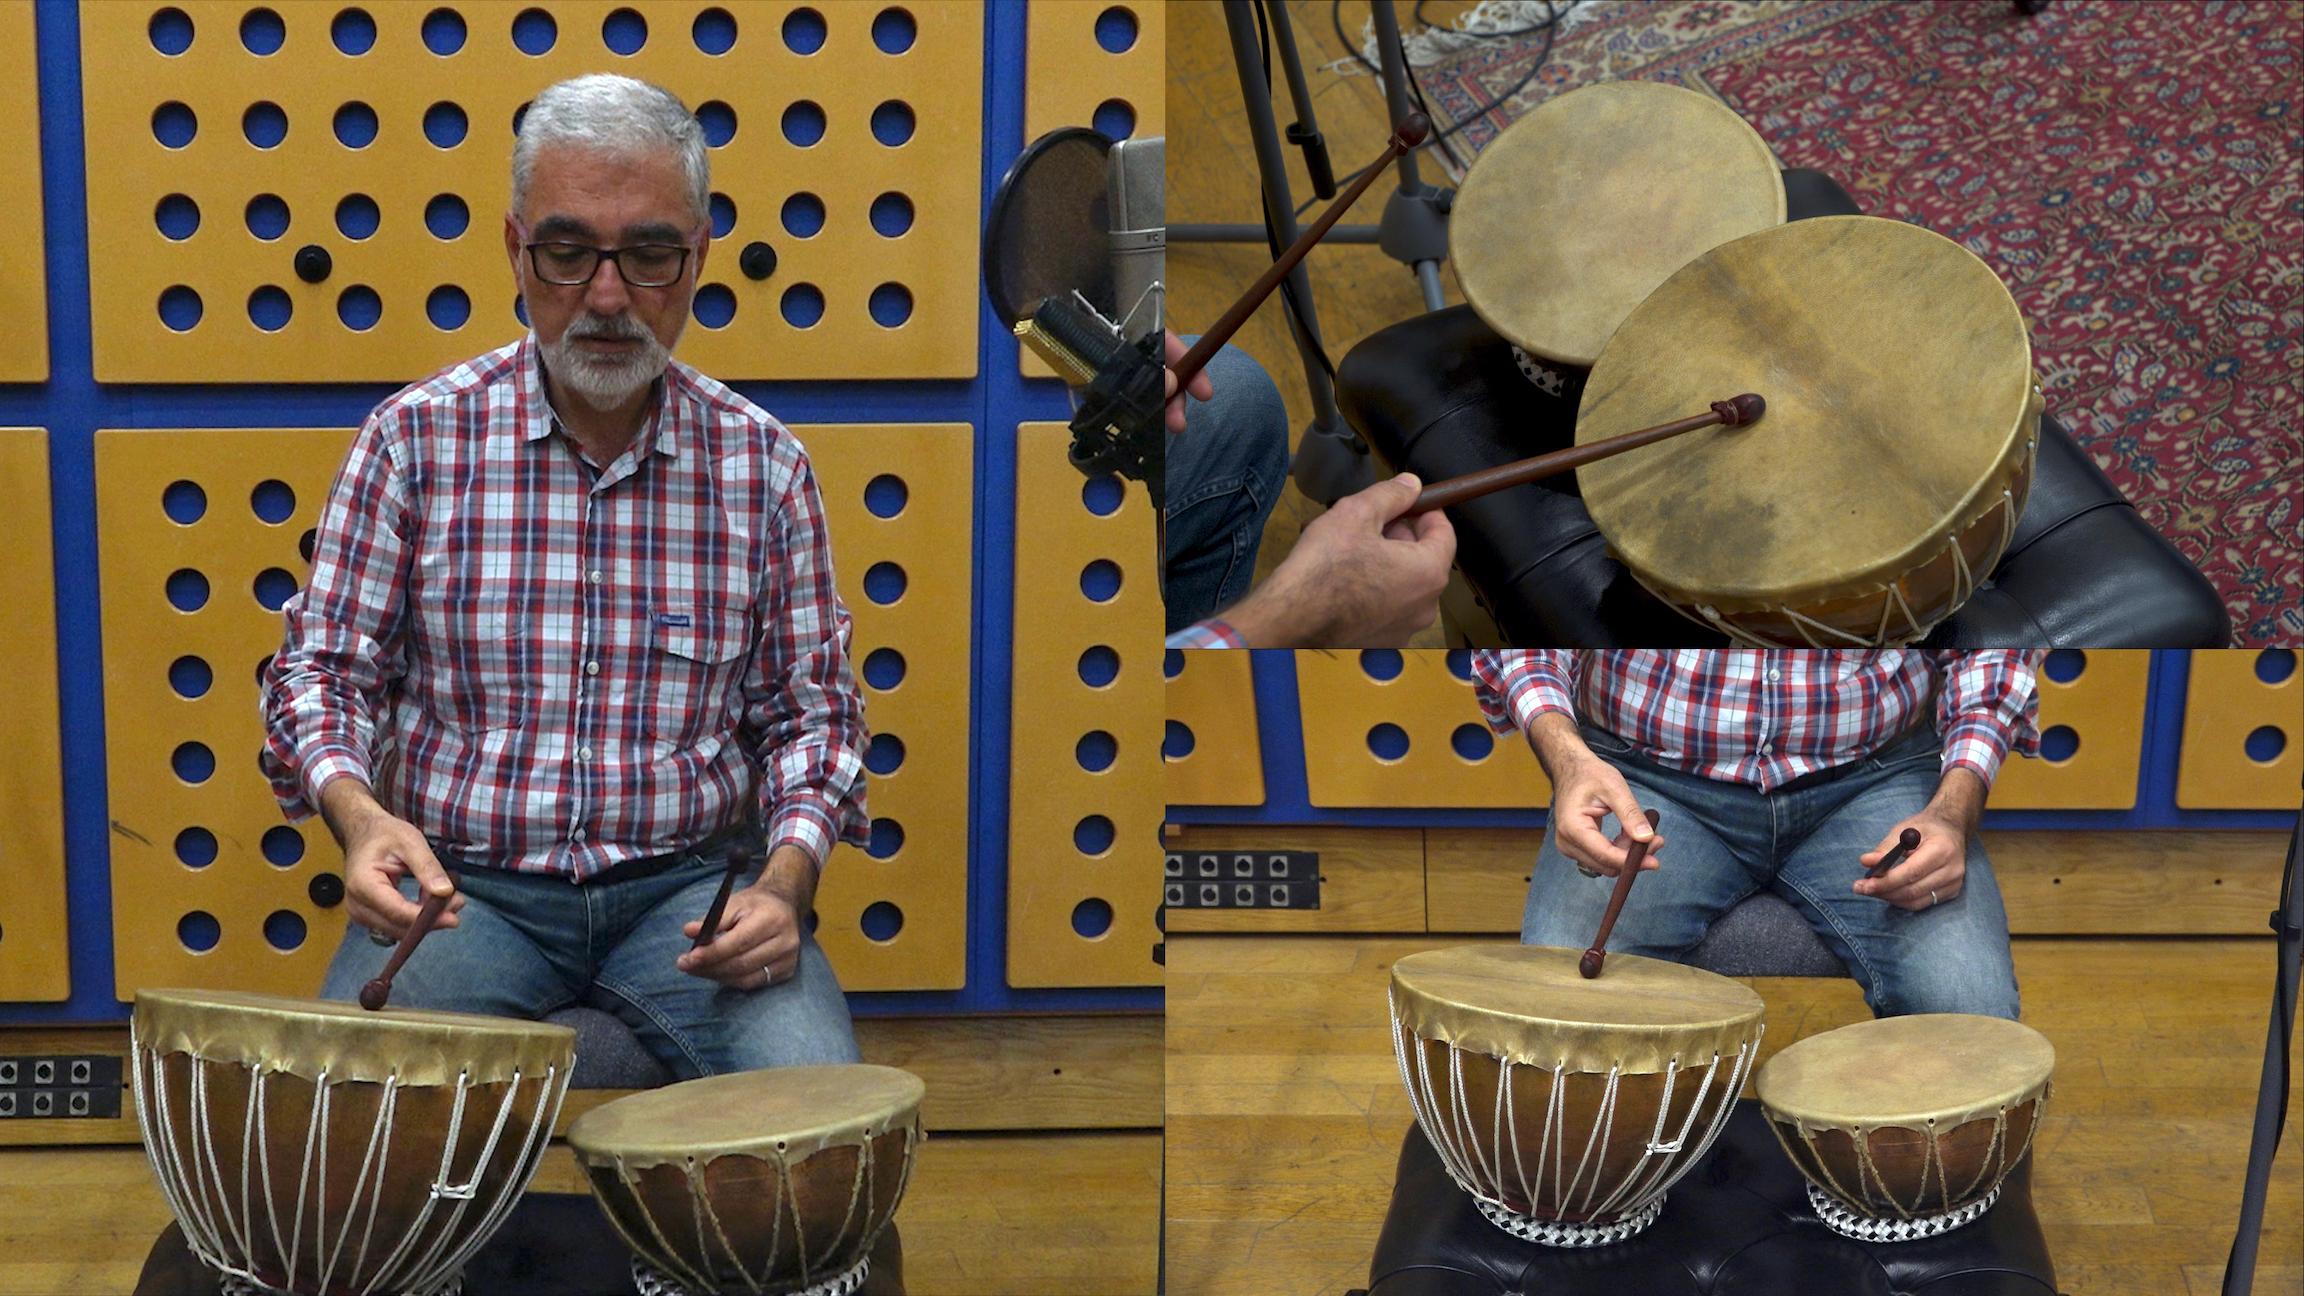 Fahrettin Yarkın (percussion)